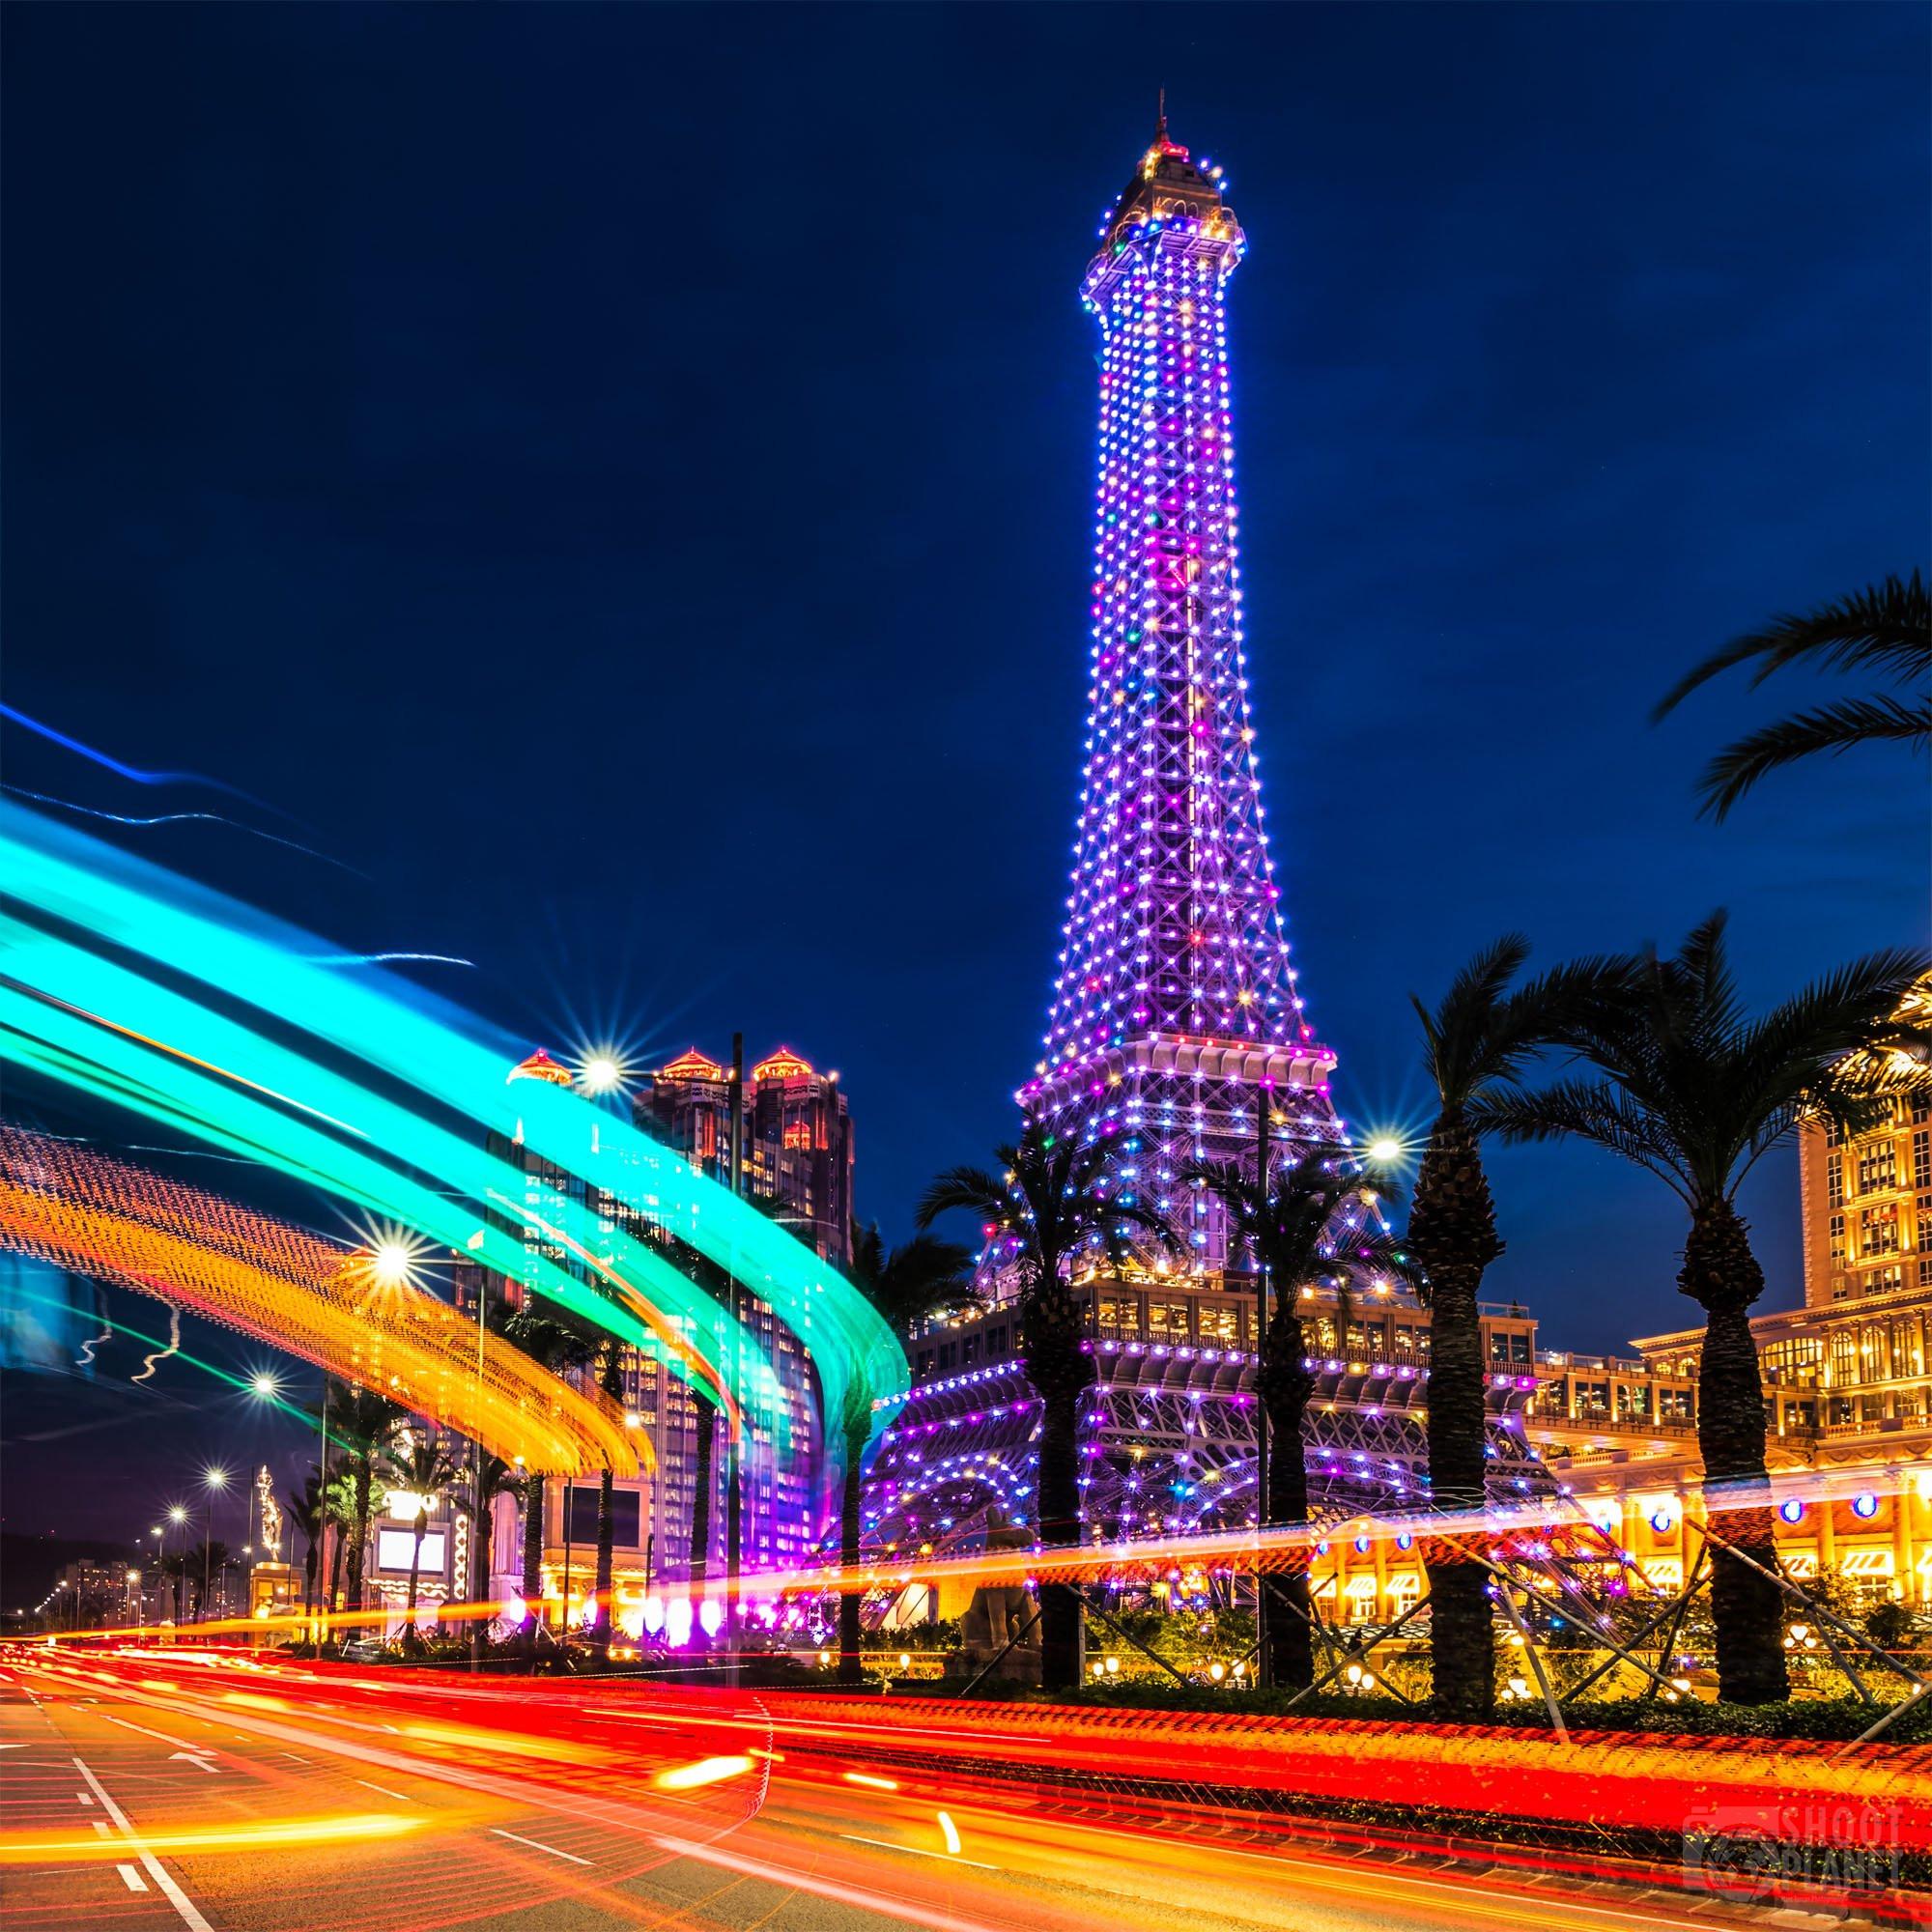 Eiffel Tower replica light trails, Macao, China